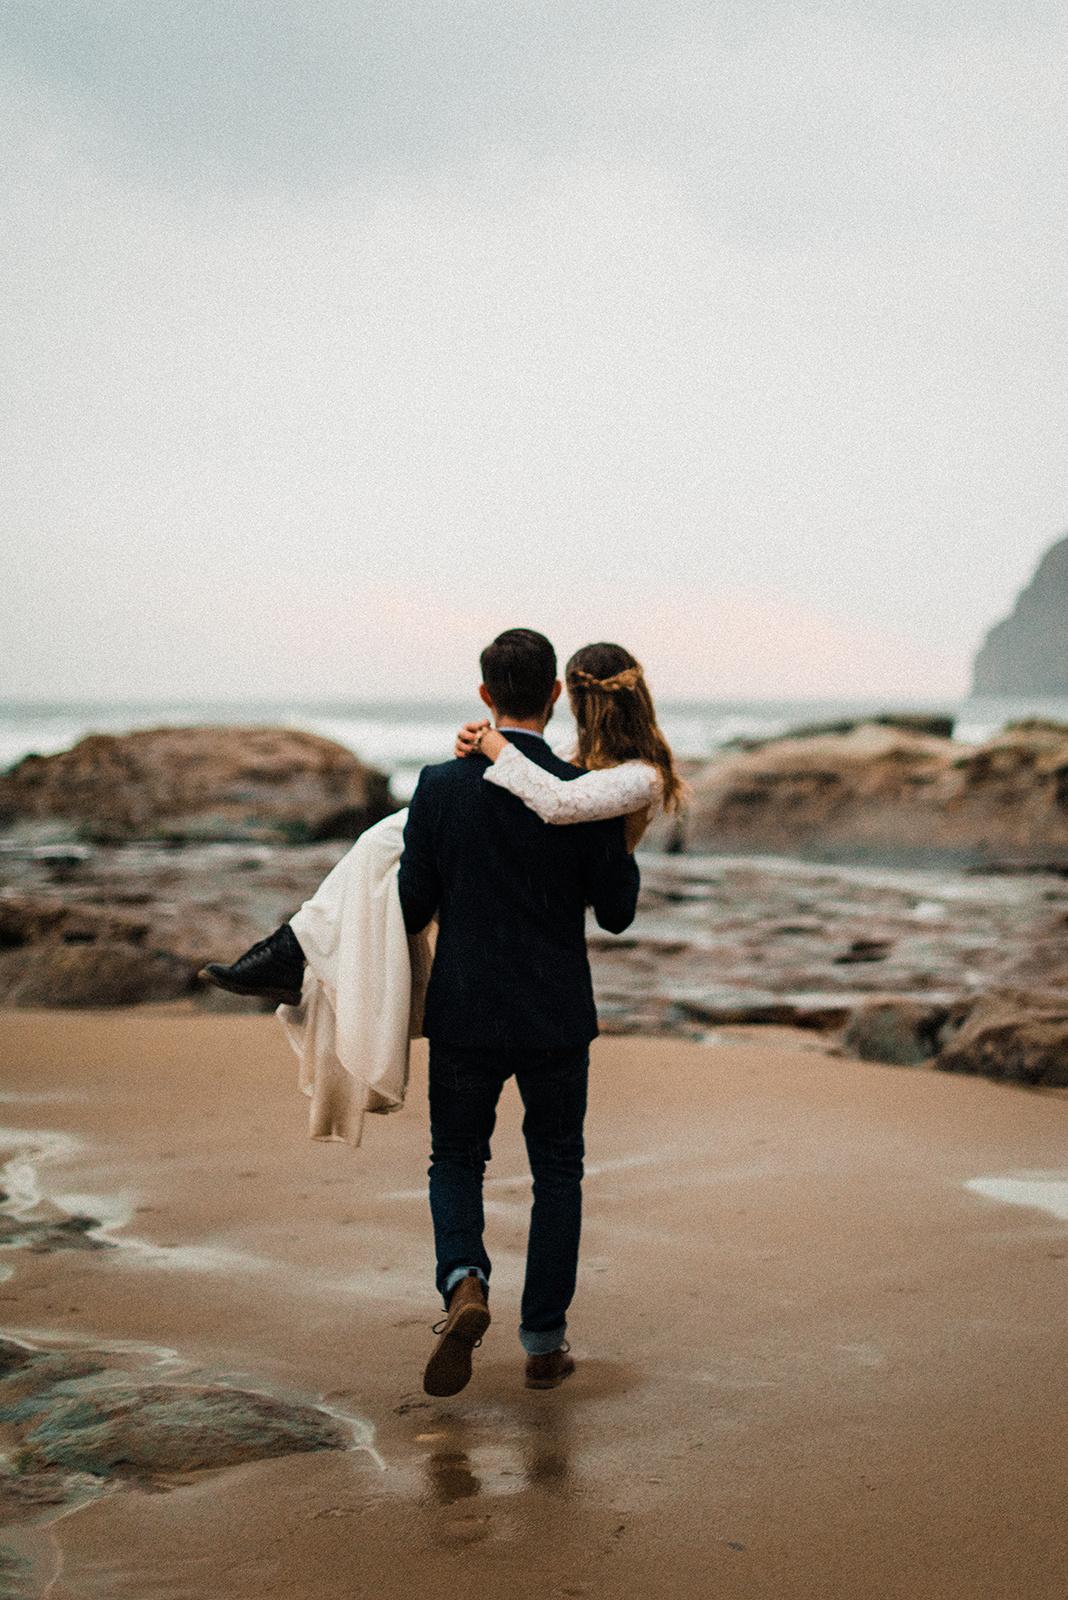 Oregon_Coast_Elopement_Wedding_The_Foxes_Photography_160.jpg